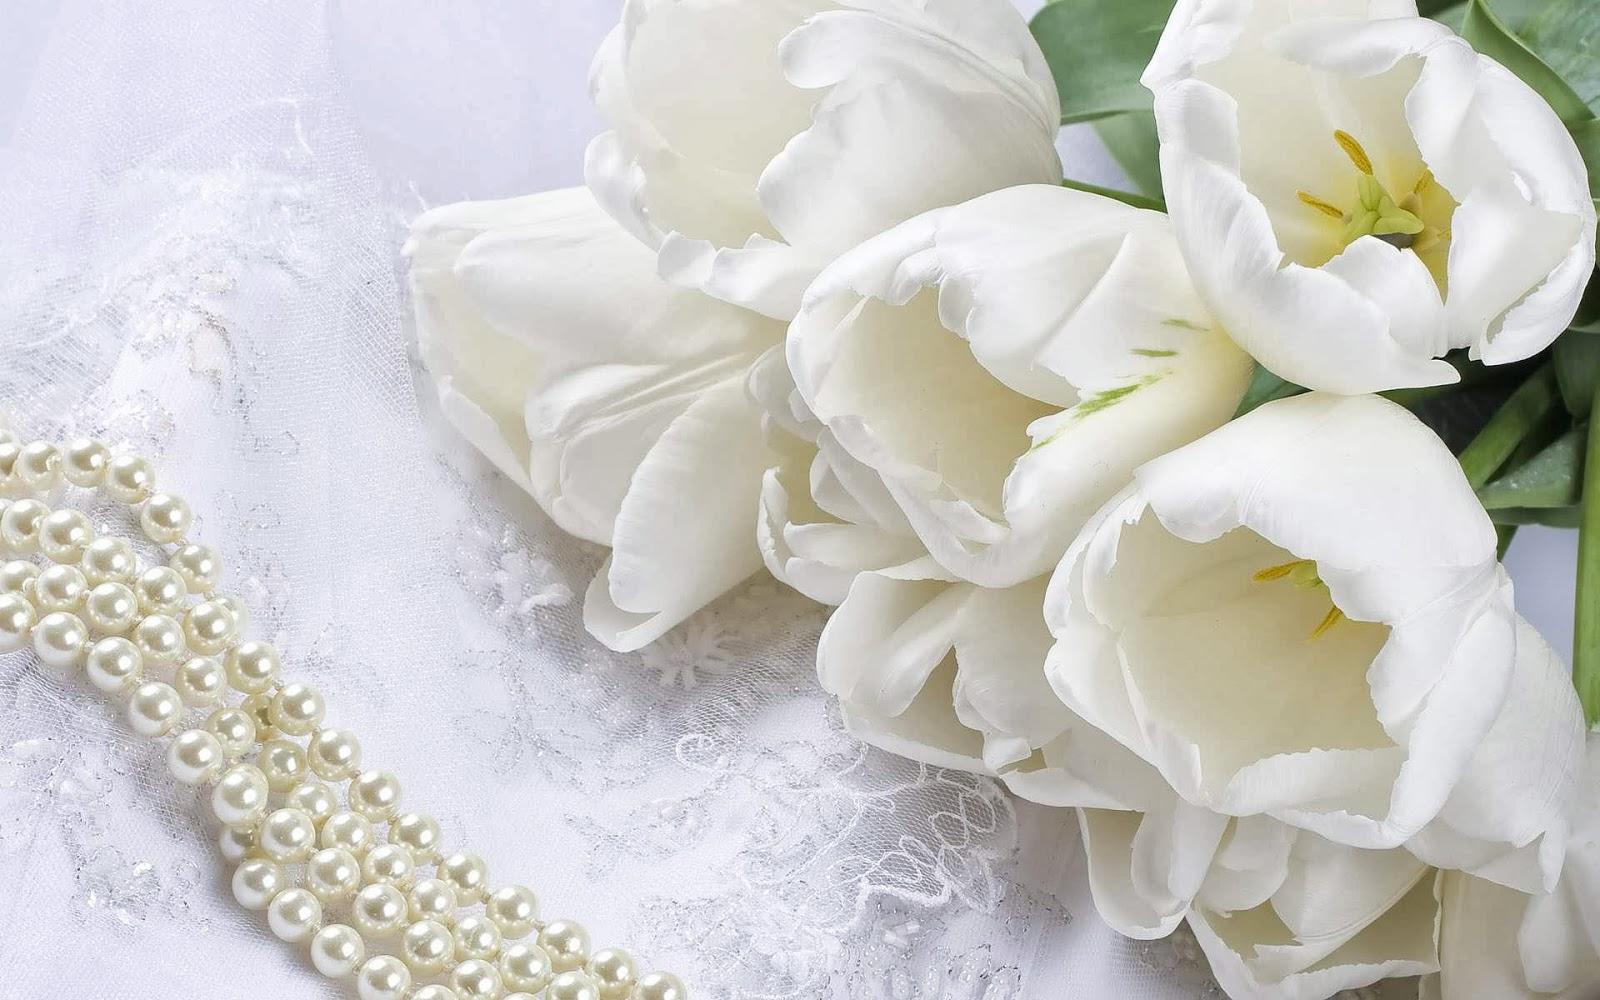 Gambar Rangkaian Bunga Mawar Putih Cantik